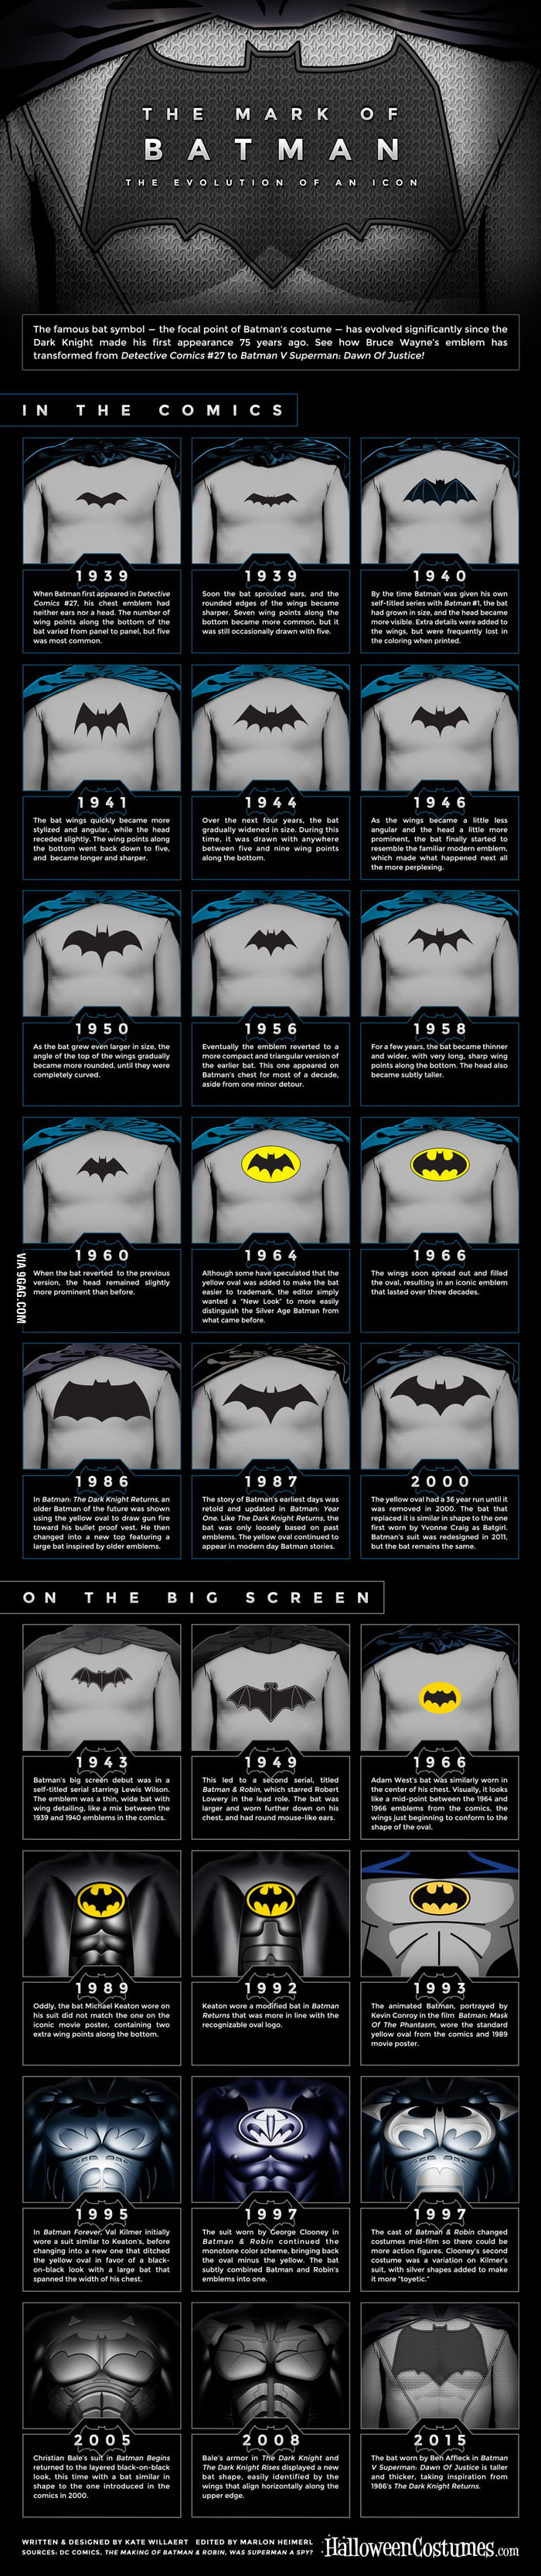 History Of The Bat Symbol 9gag